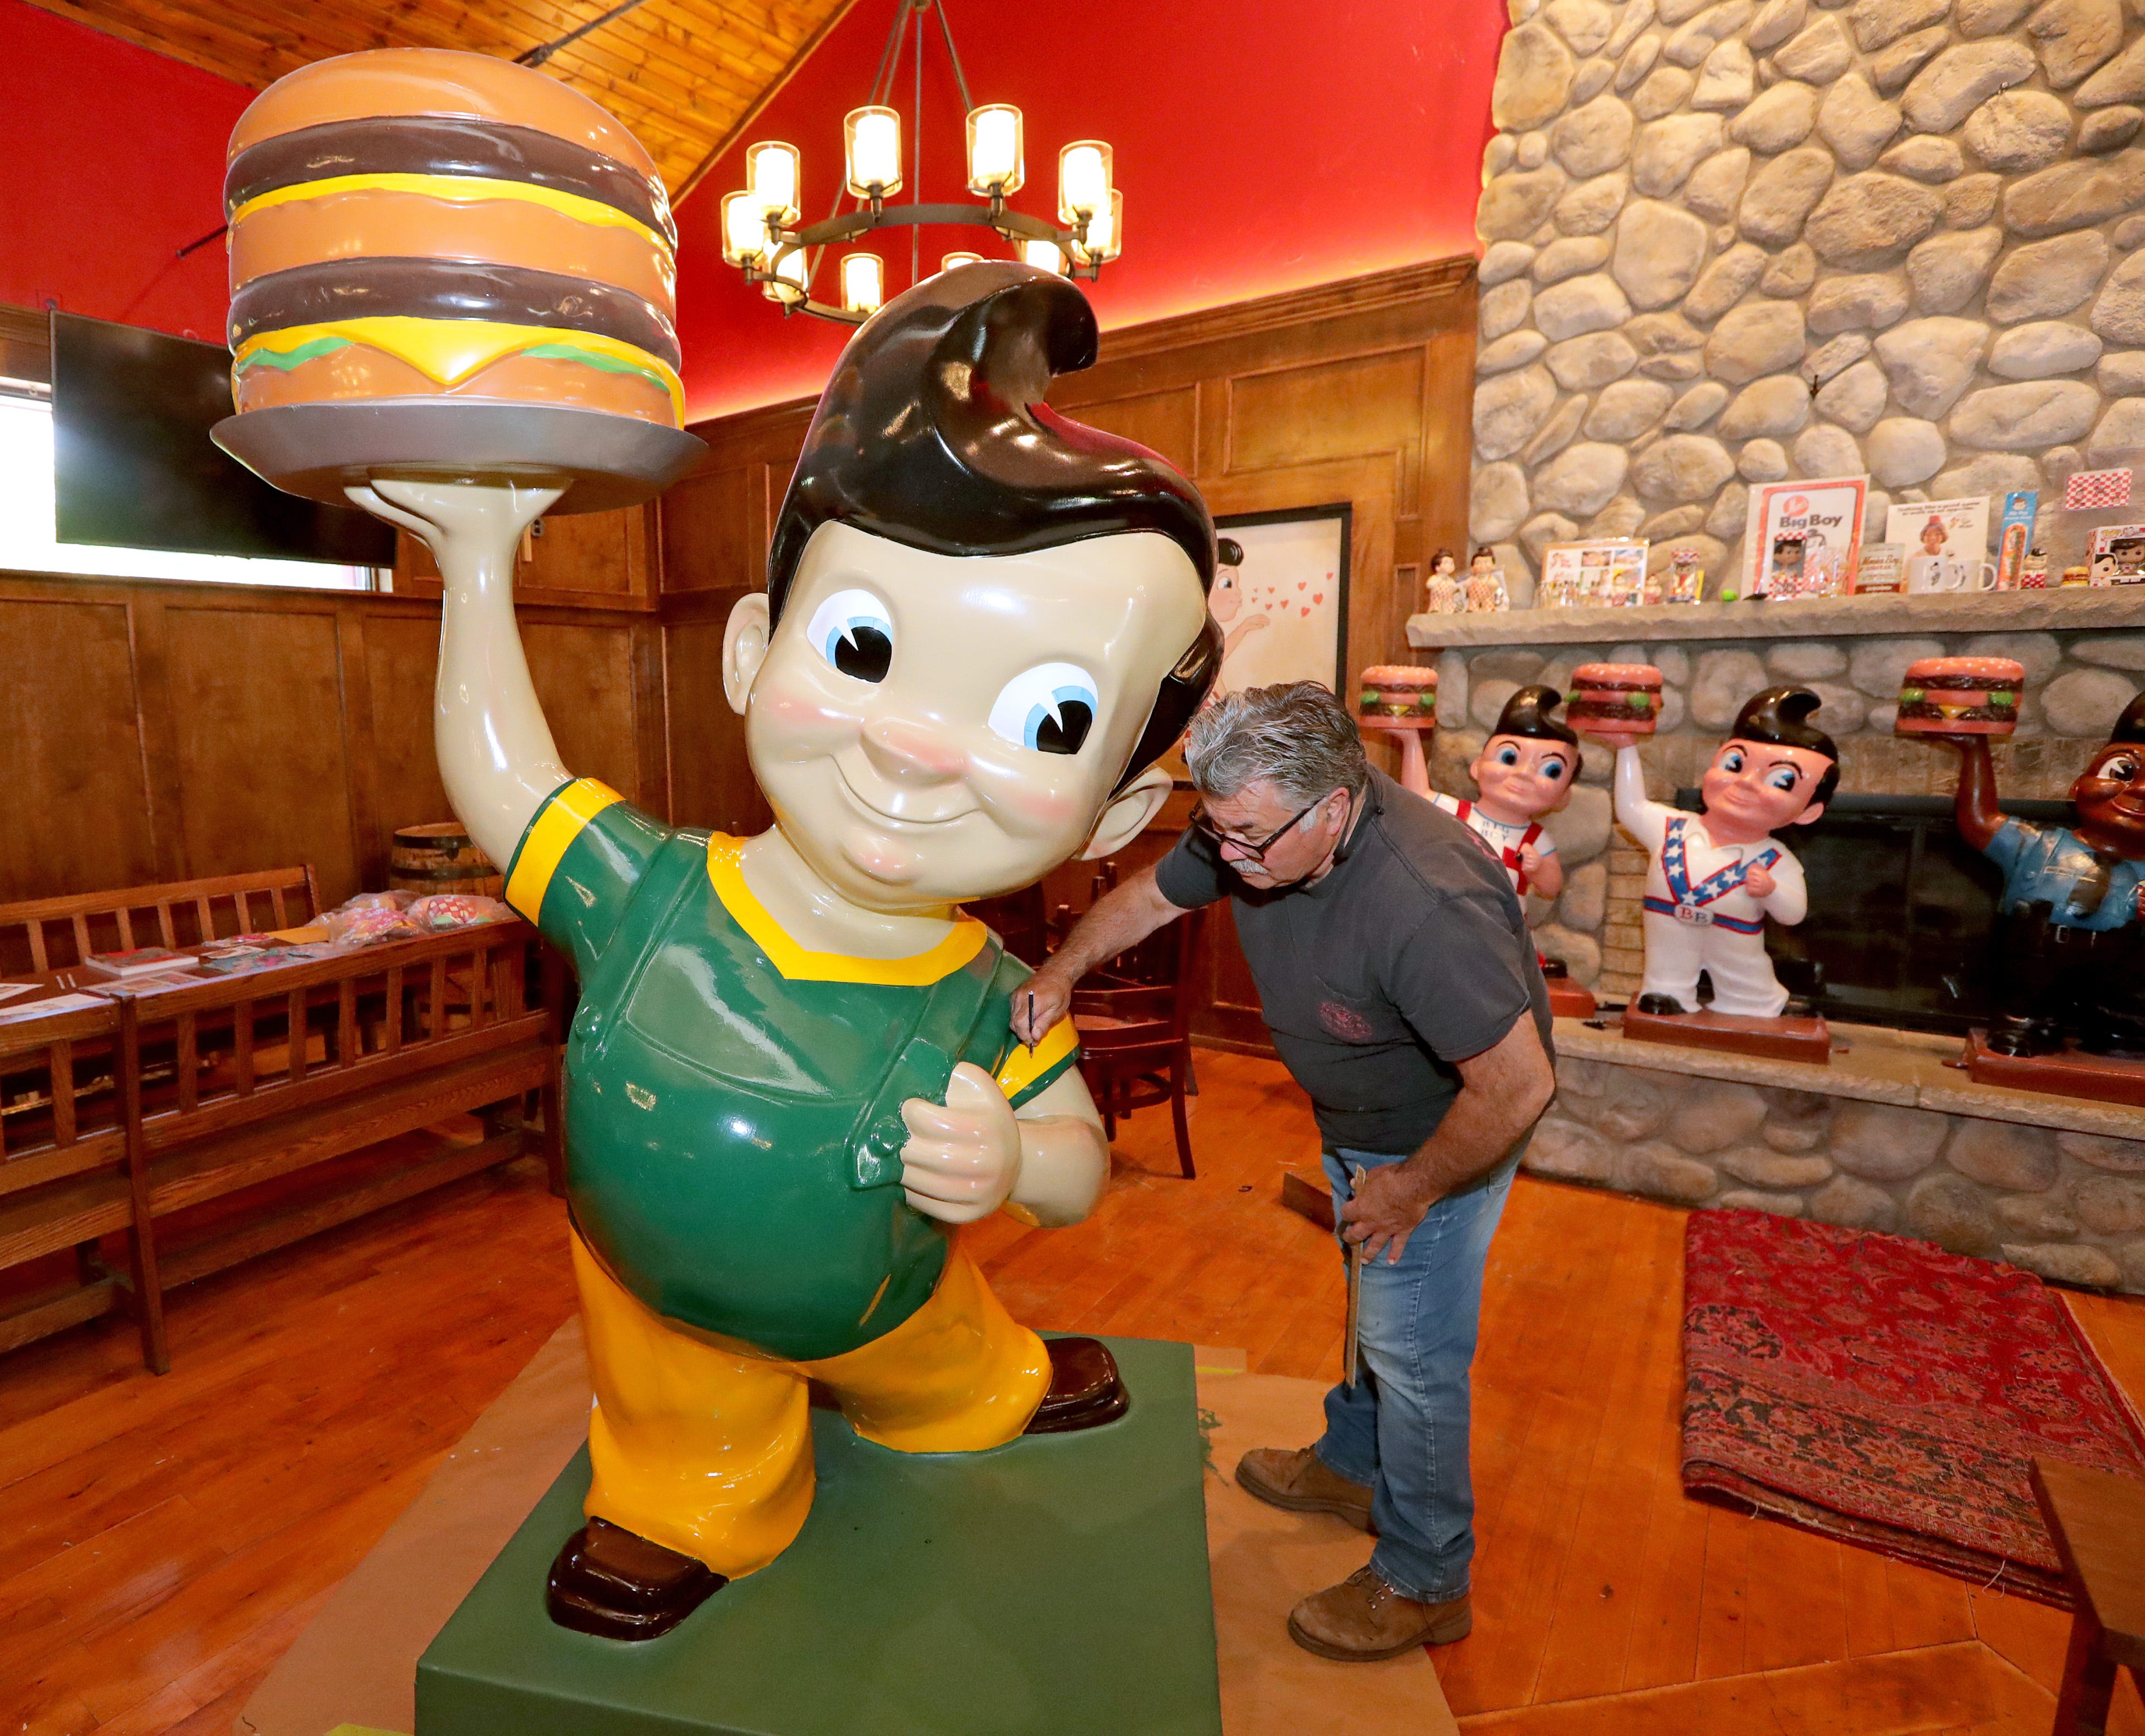 A look inside the new Big Boy restaurant in Germantown